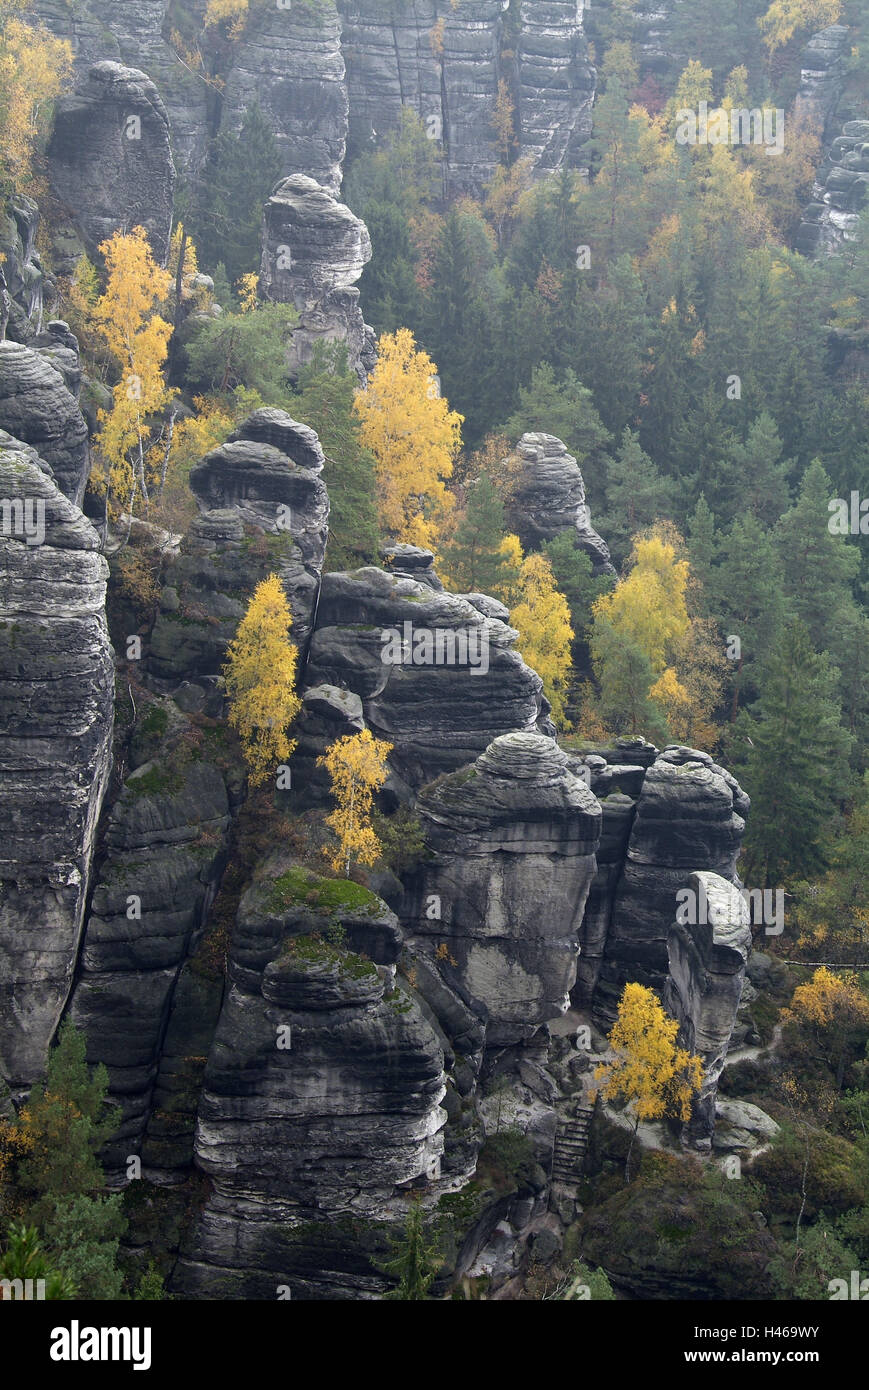 Germany, Saxony, Elbsandsteingebirge, bastion, - Stock Image